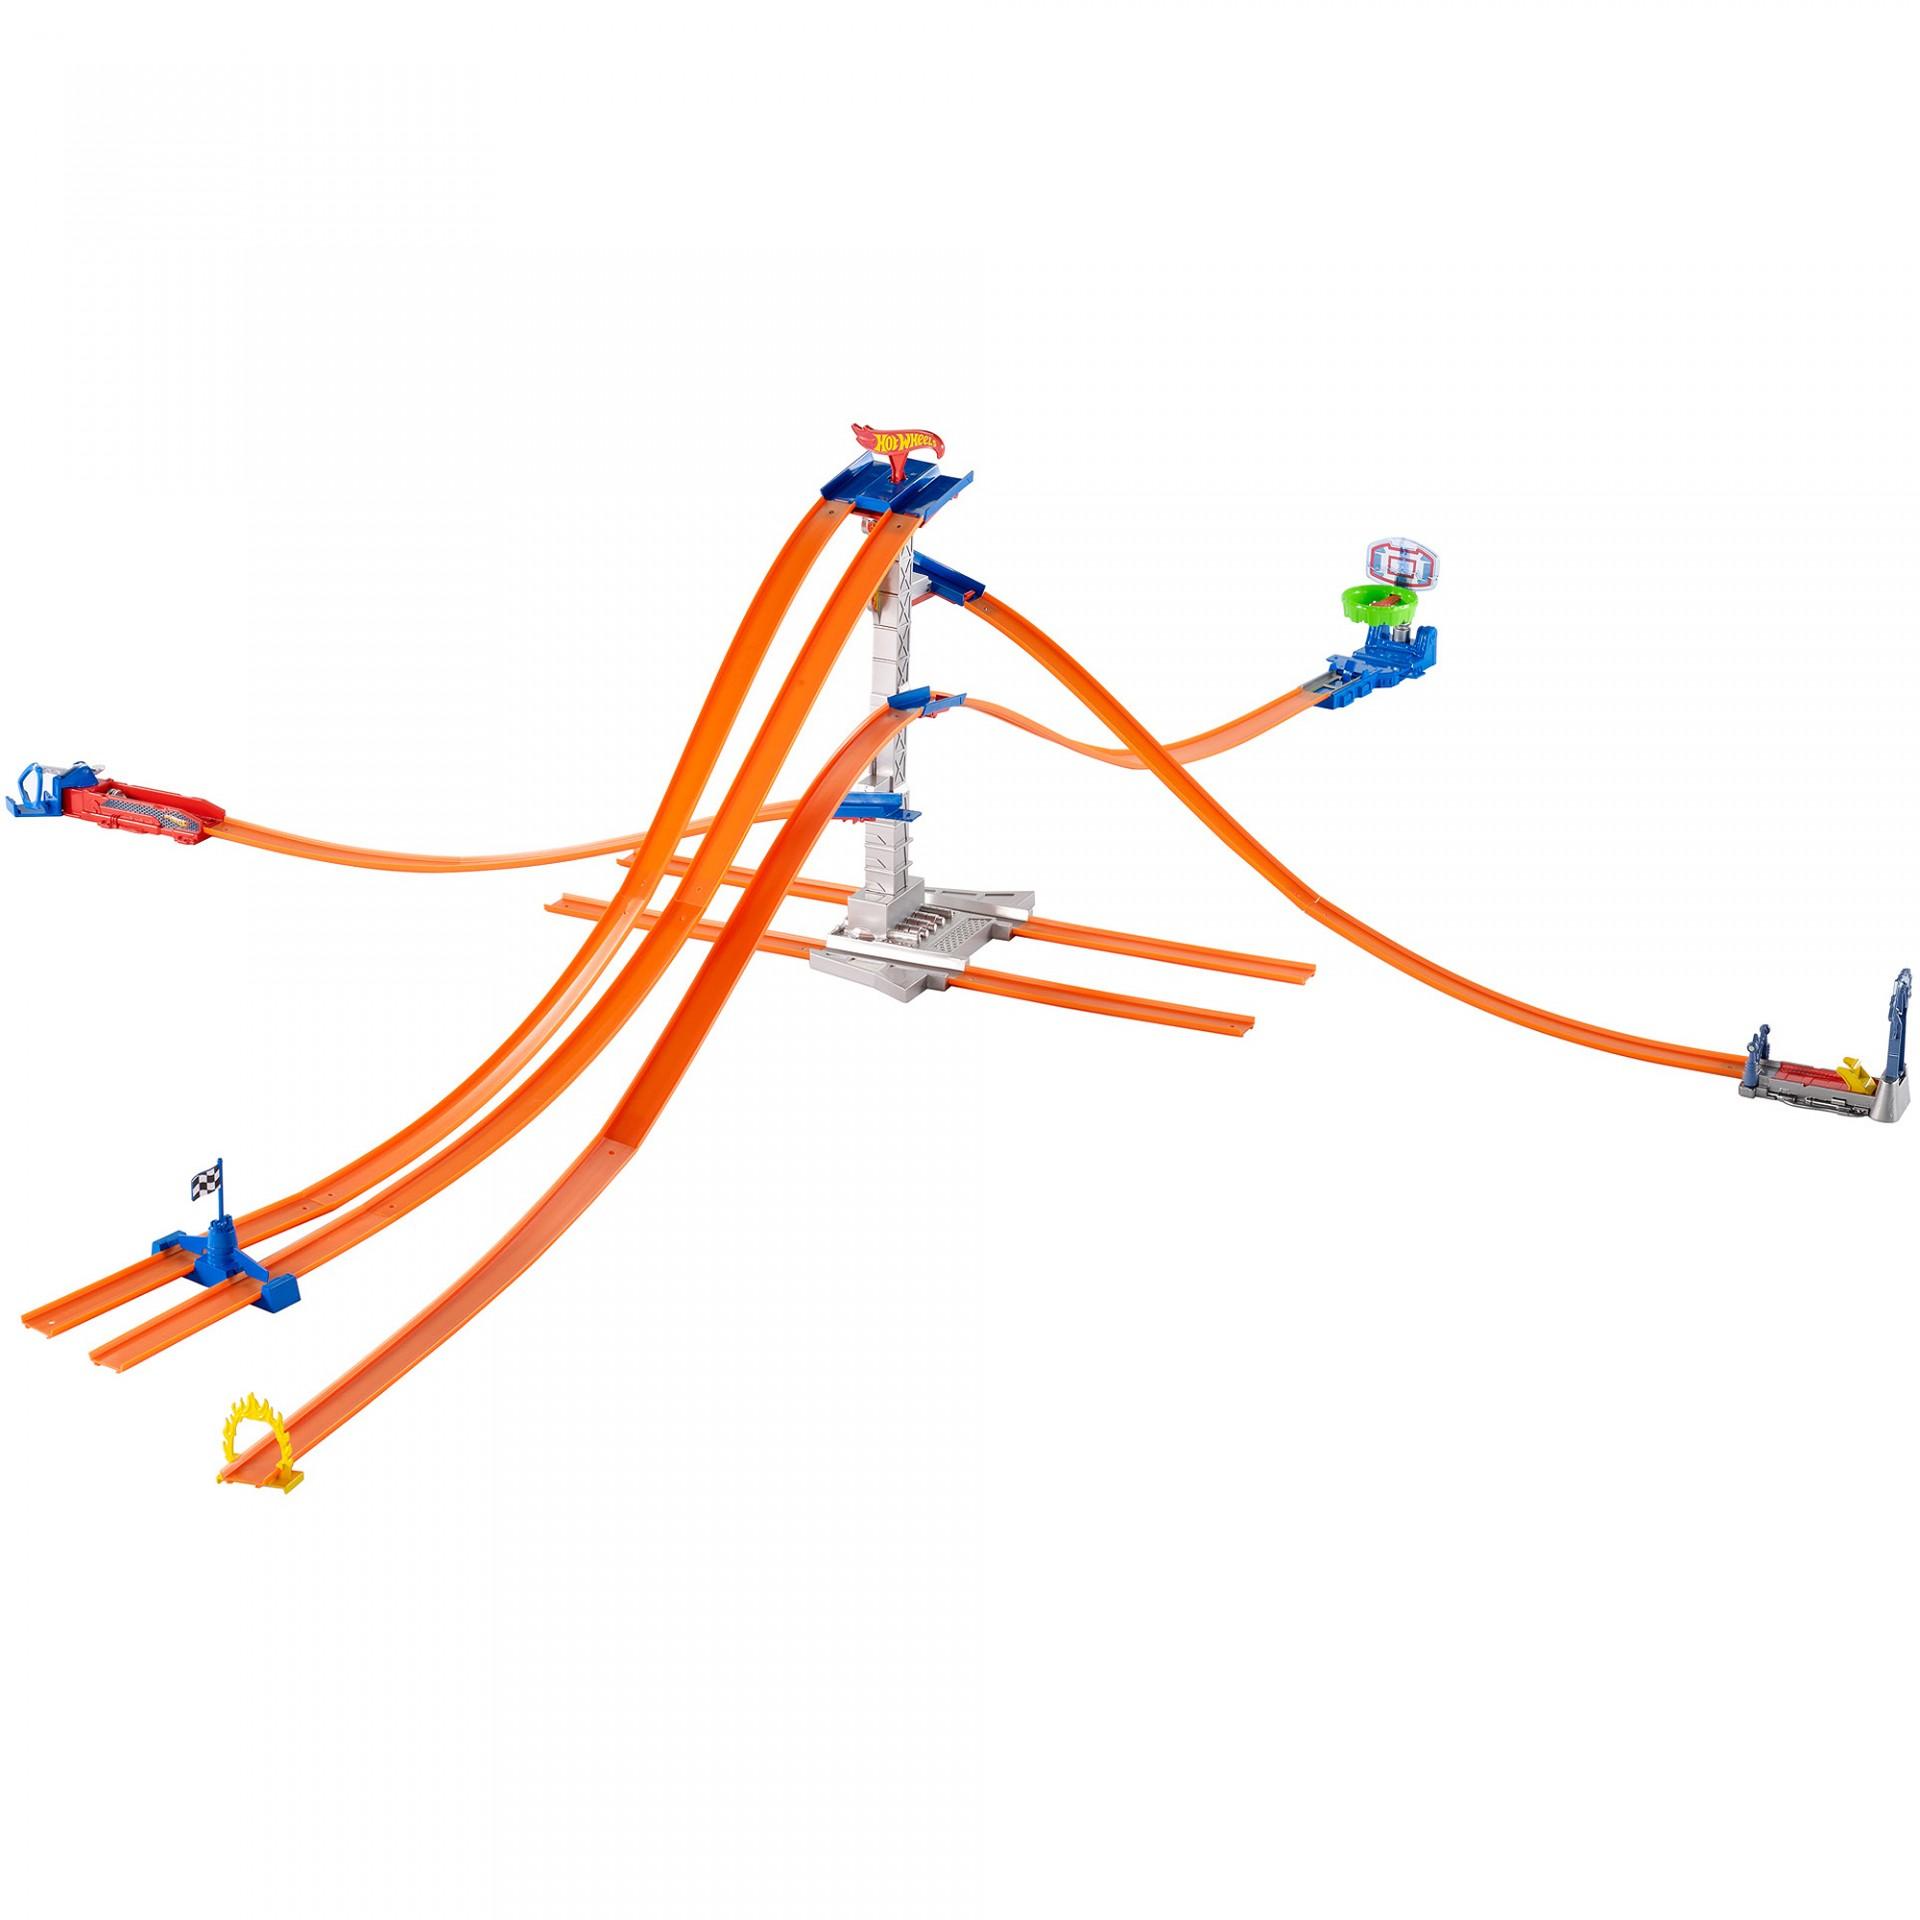 Купить Трек Hot Wheels Хот Вилс Стартовый набор 5 в 1 Башня гонок (Hot Wheels Track Builder 5-Lane Tower Starter) от